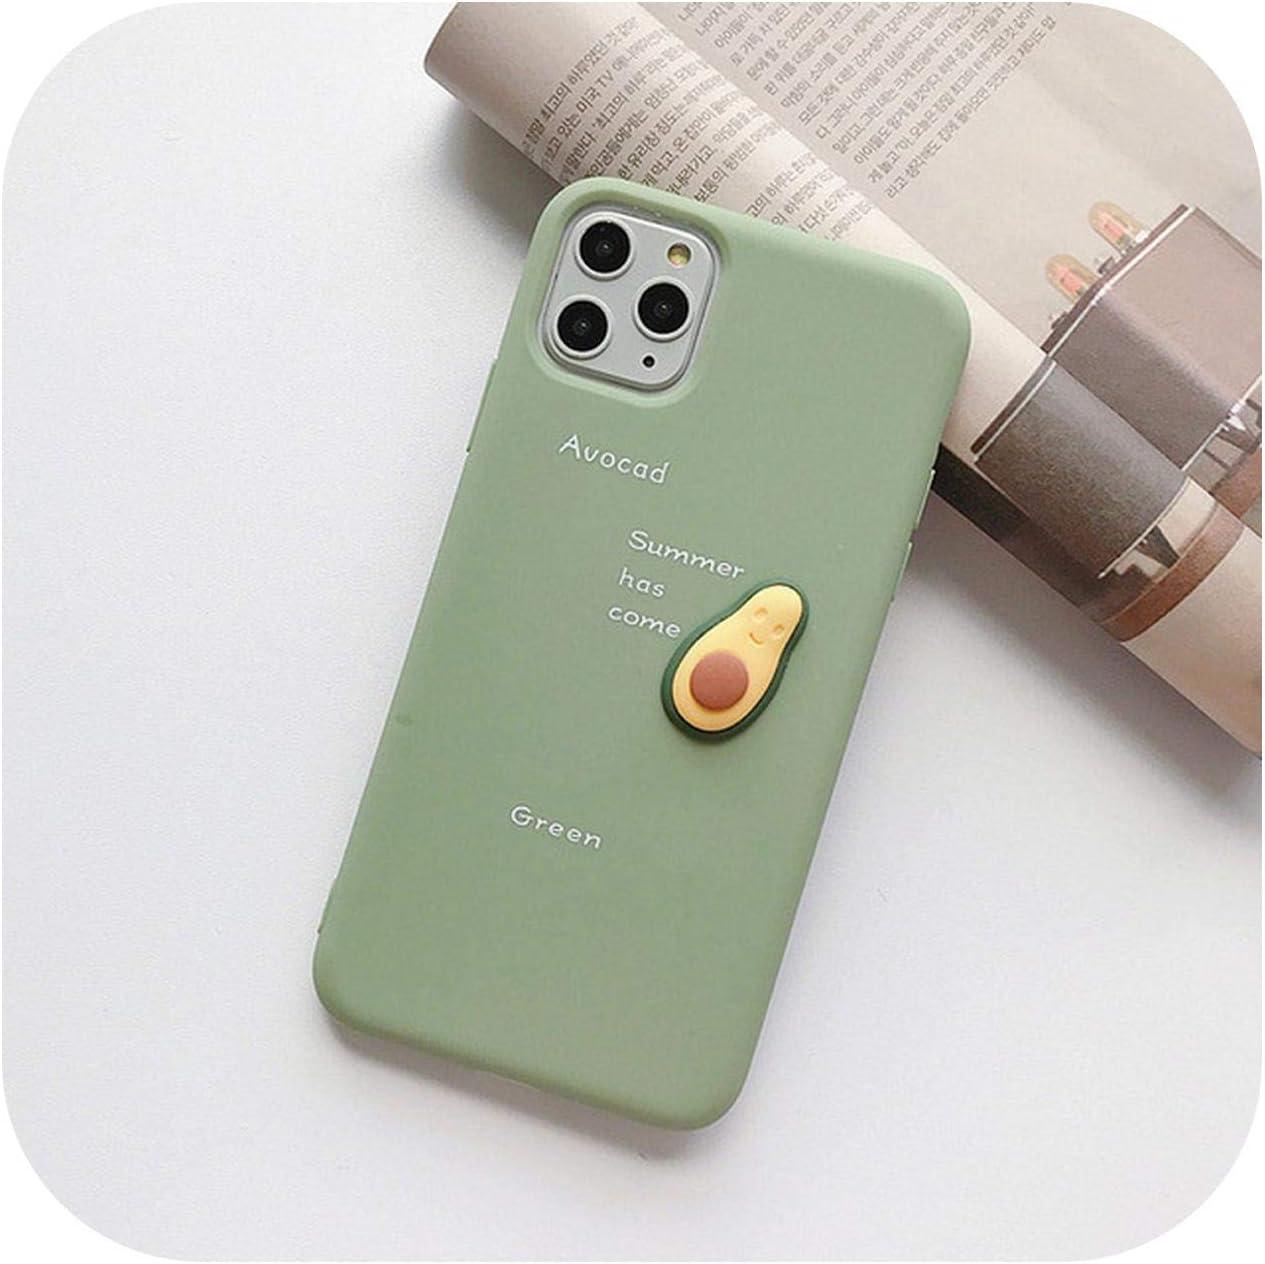 6 6S Plus 11 7 RaCarrot aguacate suave de TPU dise/ño de frutas Carcasa para iPhone 11 Pro XS Max XR X 8